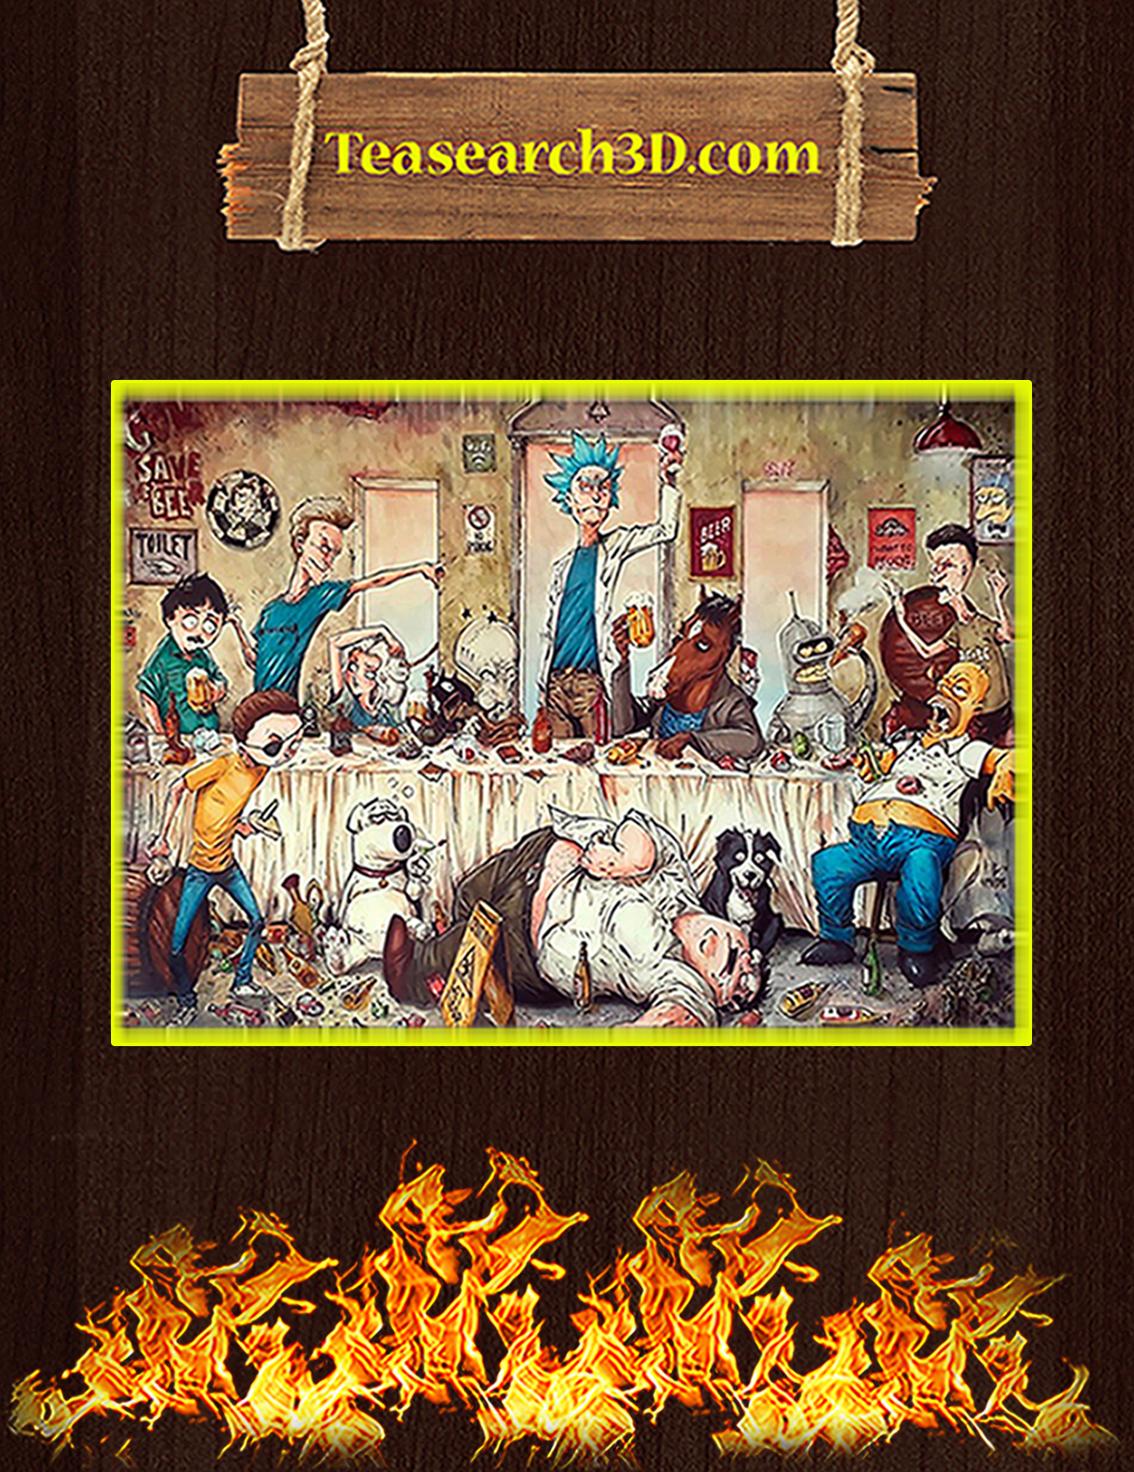 Adult Cartoons Art Work By Marcelo Ventura Poster A3